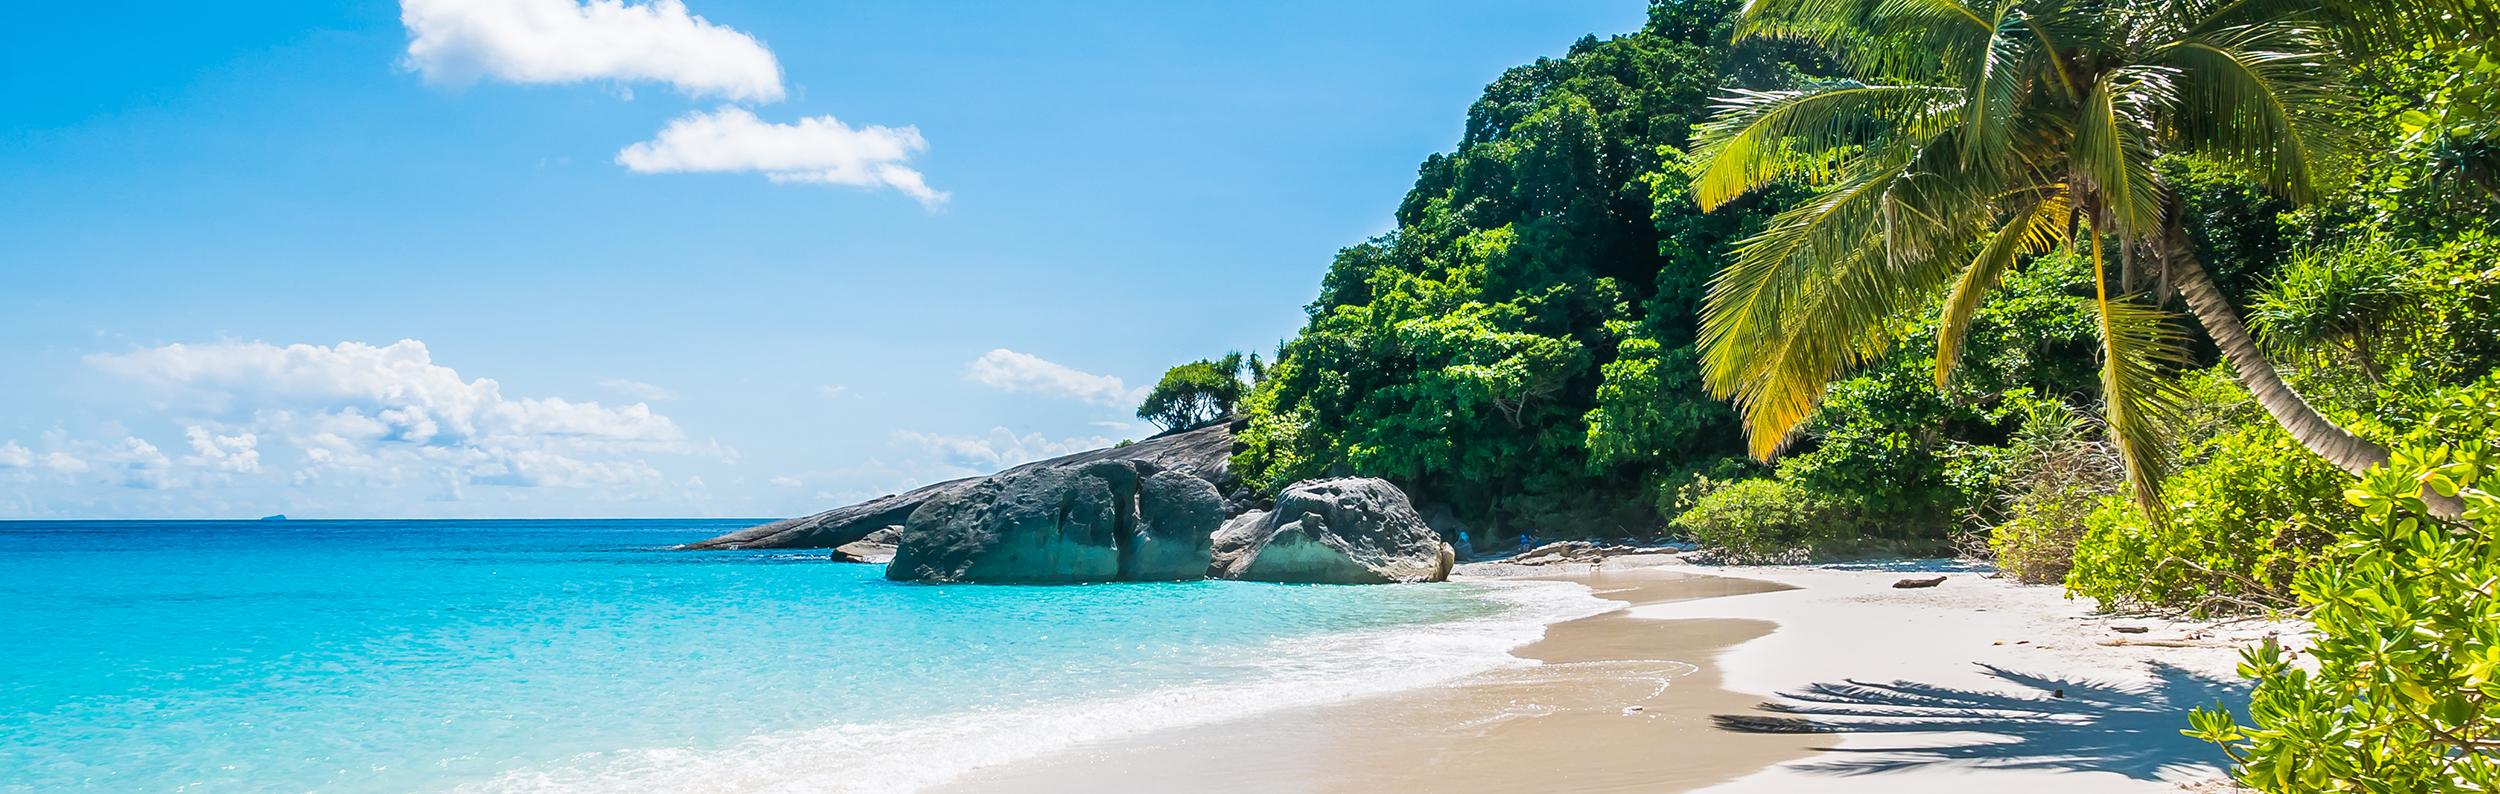 praia - INÍCIO